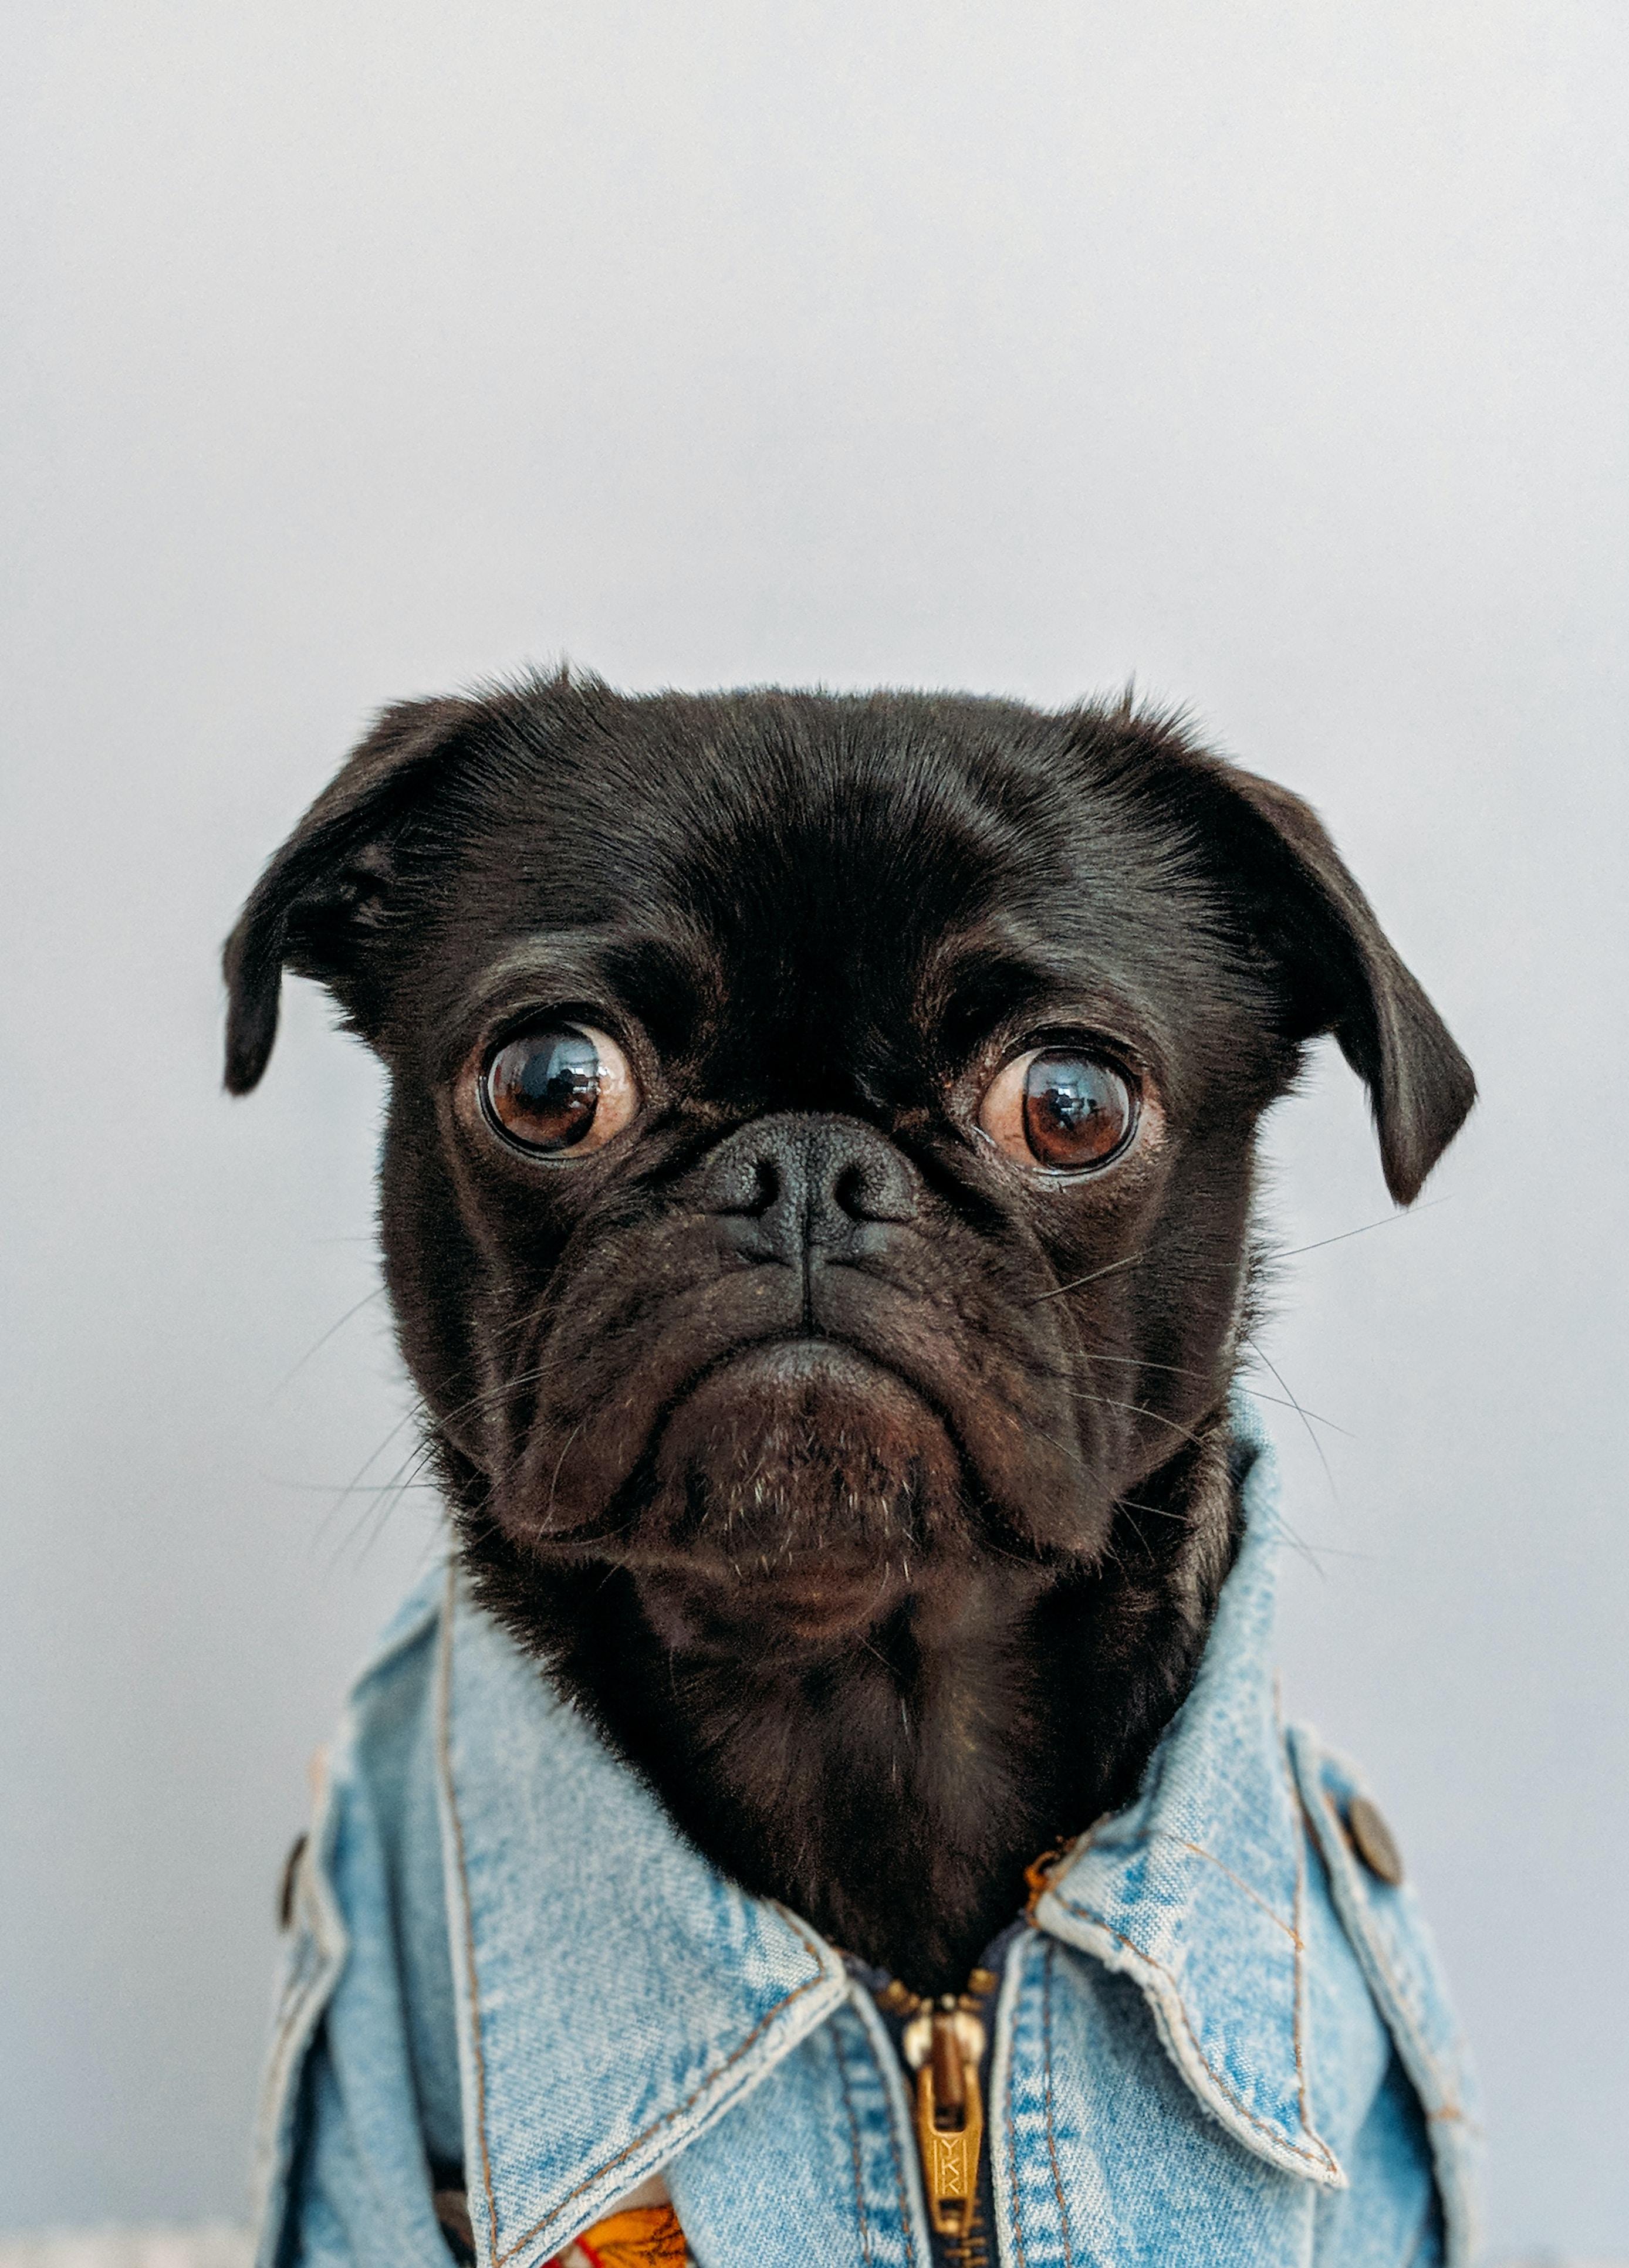 dog pictures download free images on unsplash